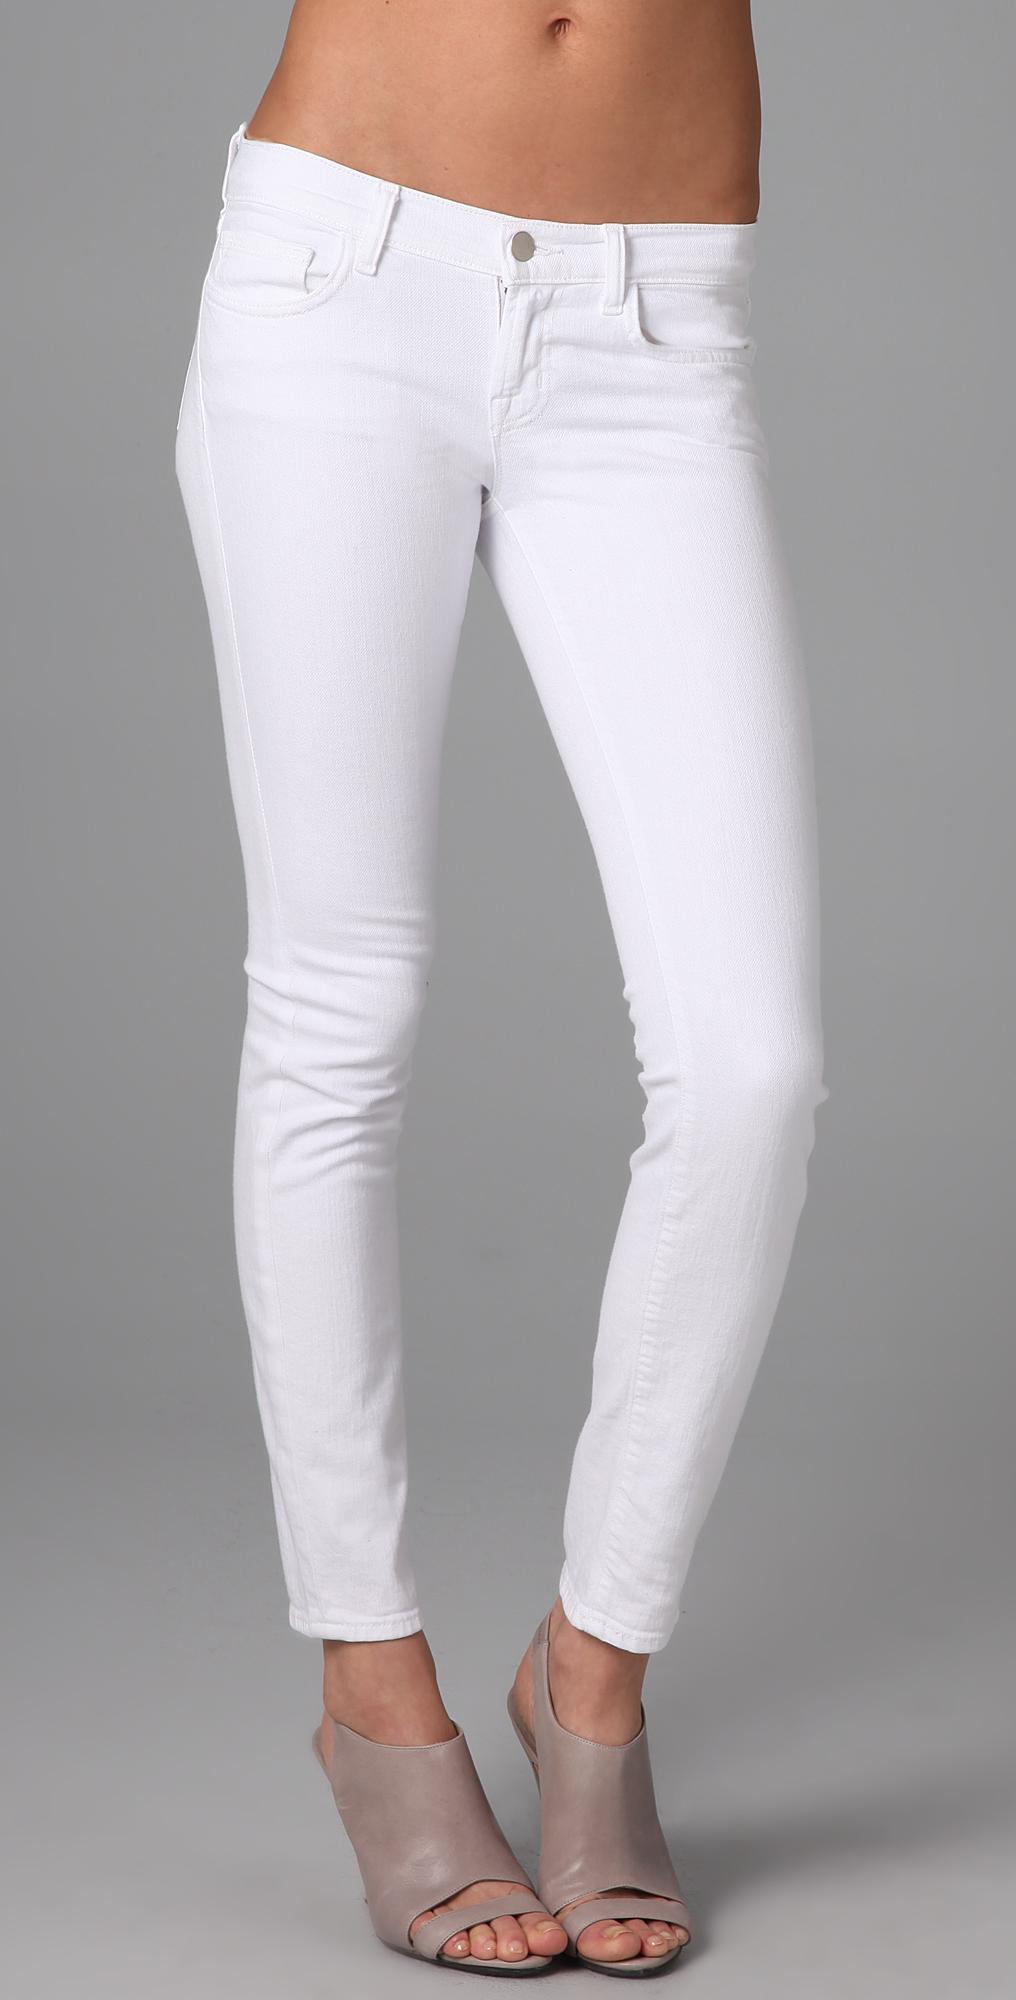 J Brand 910 Ankle Skinny Jeans | SHOPBOP Extra 25% Off Sale Styles ...